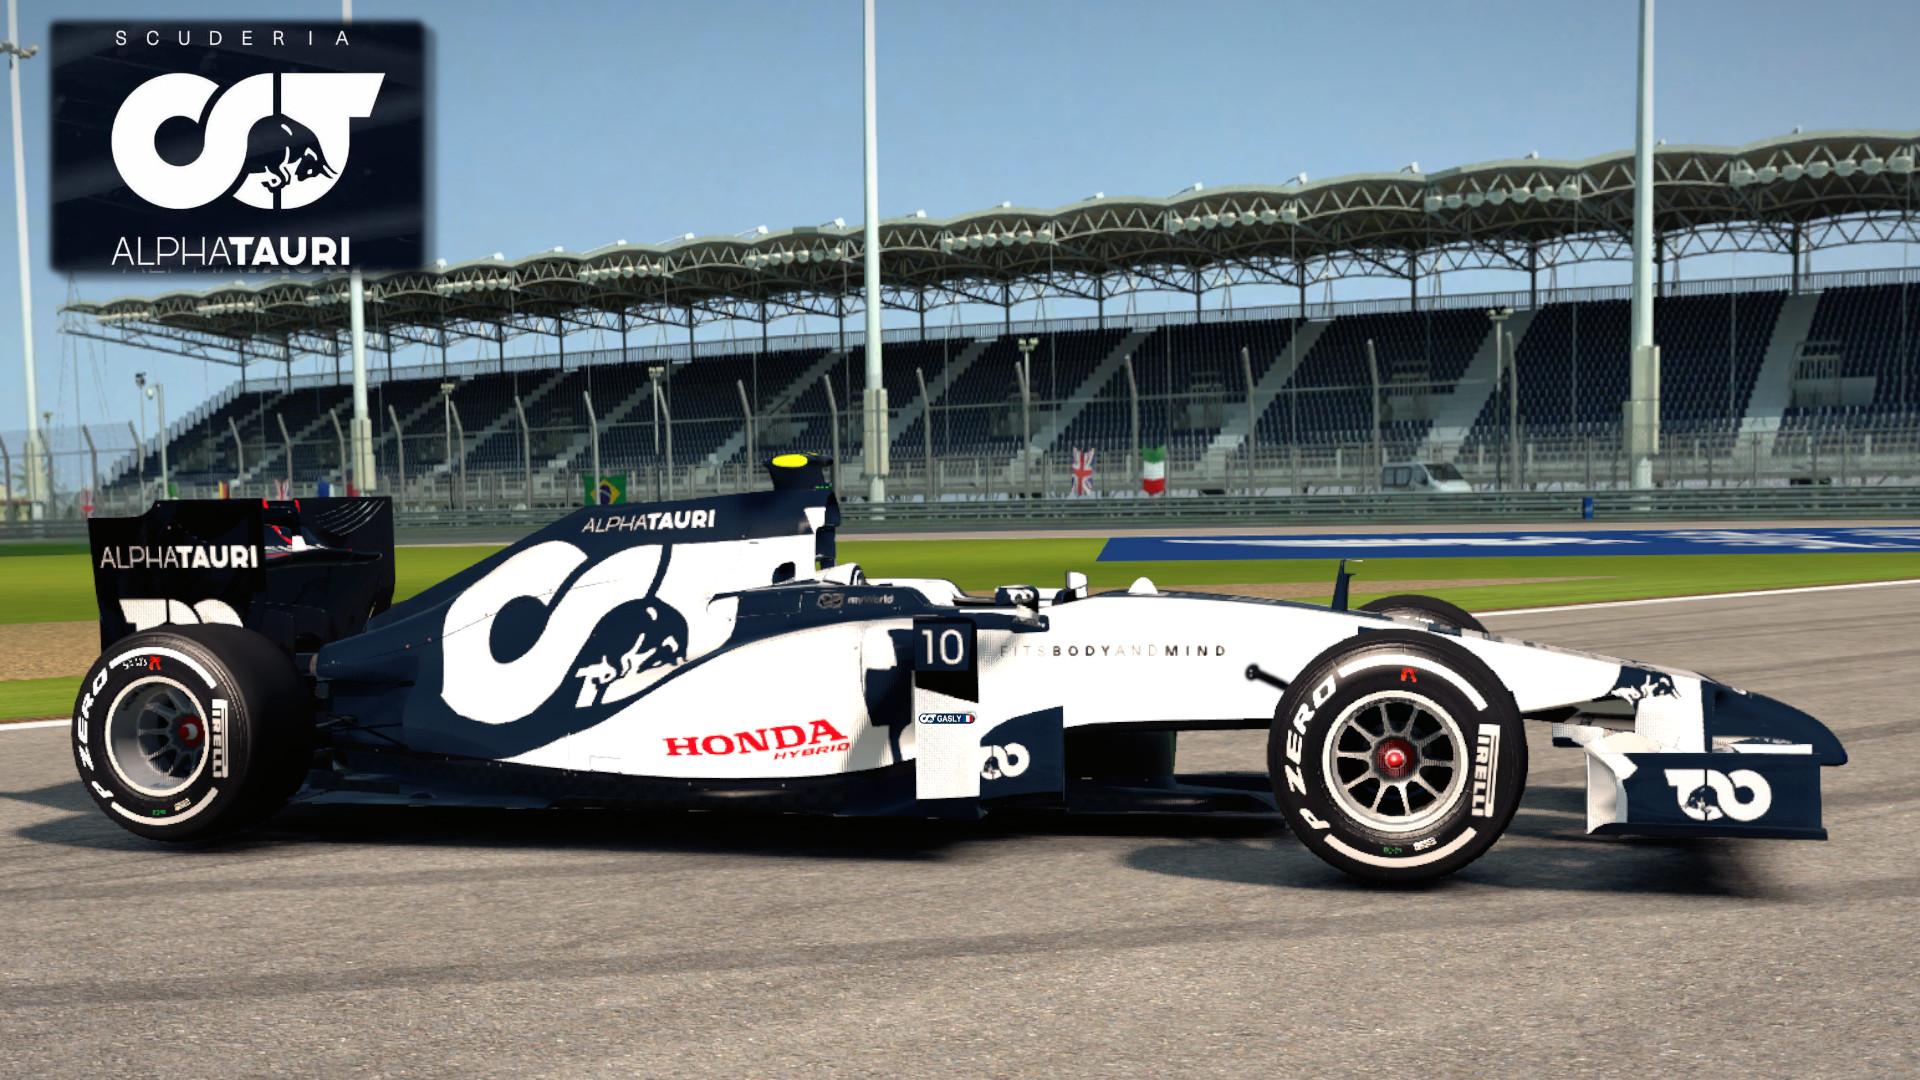 Skyfall F1 2020 Scuderia Alpha Tauri Honda At 01 Livery Mod Racedepartment